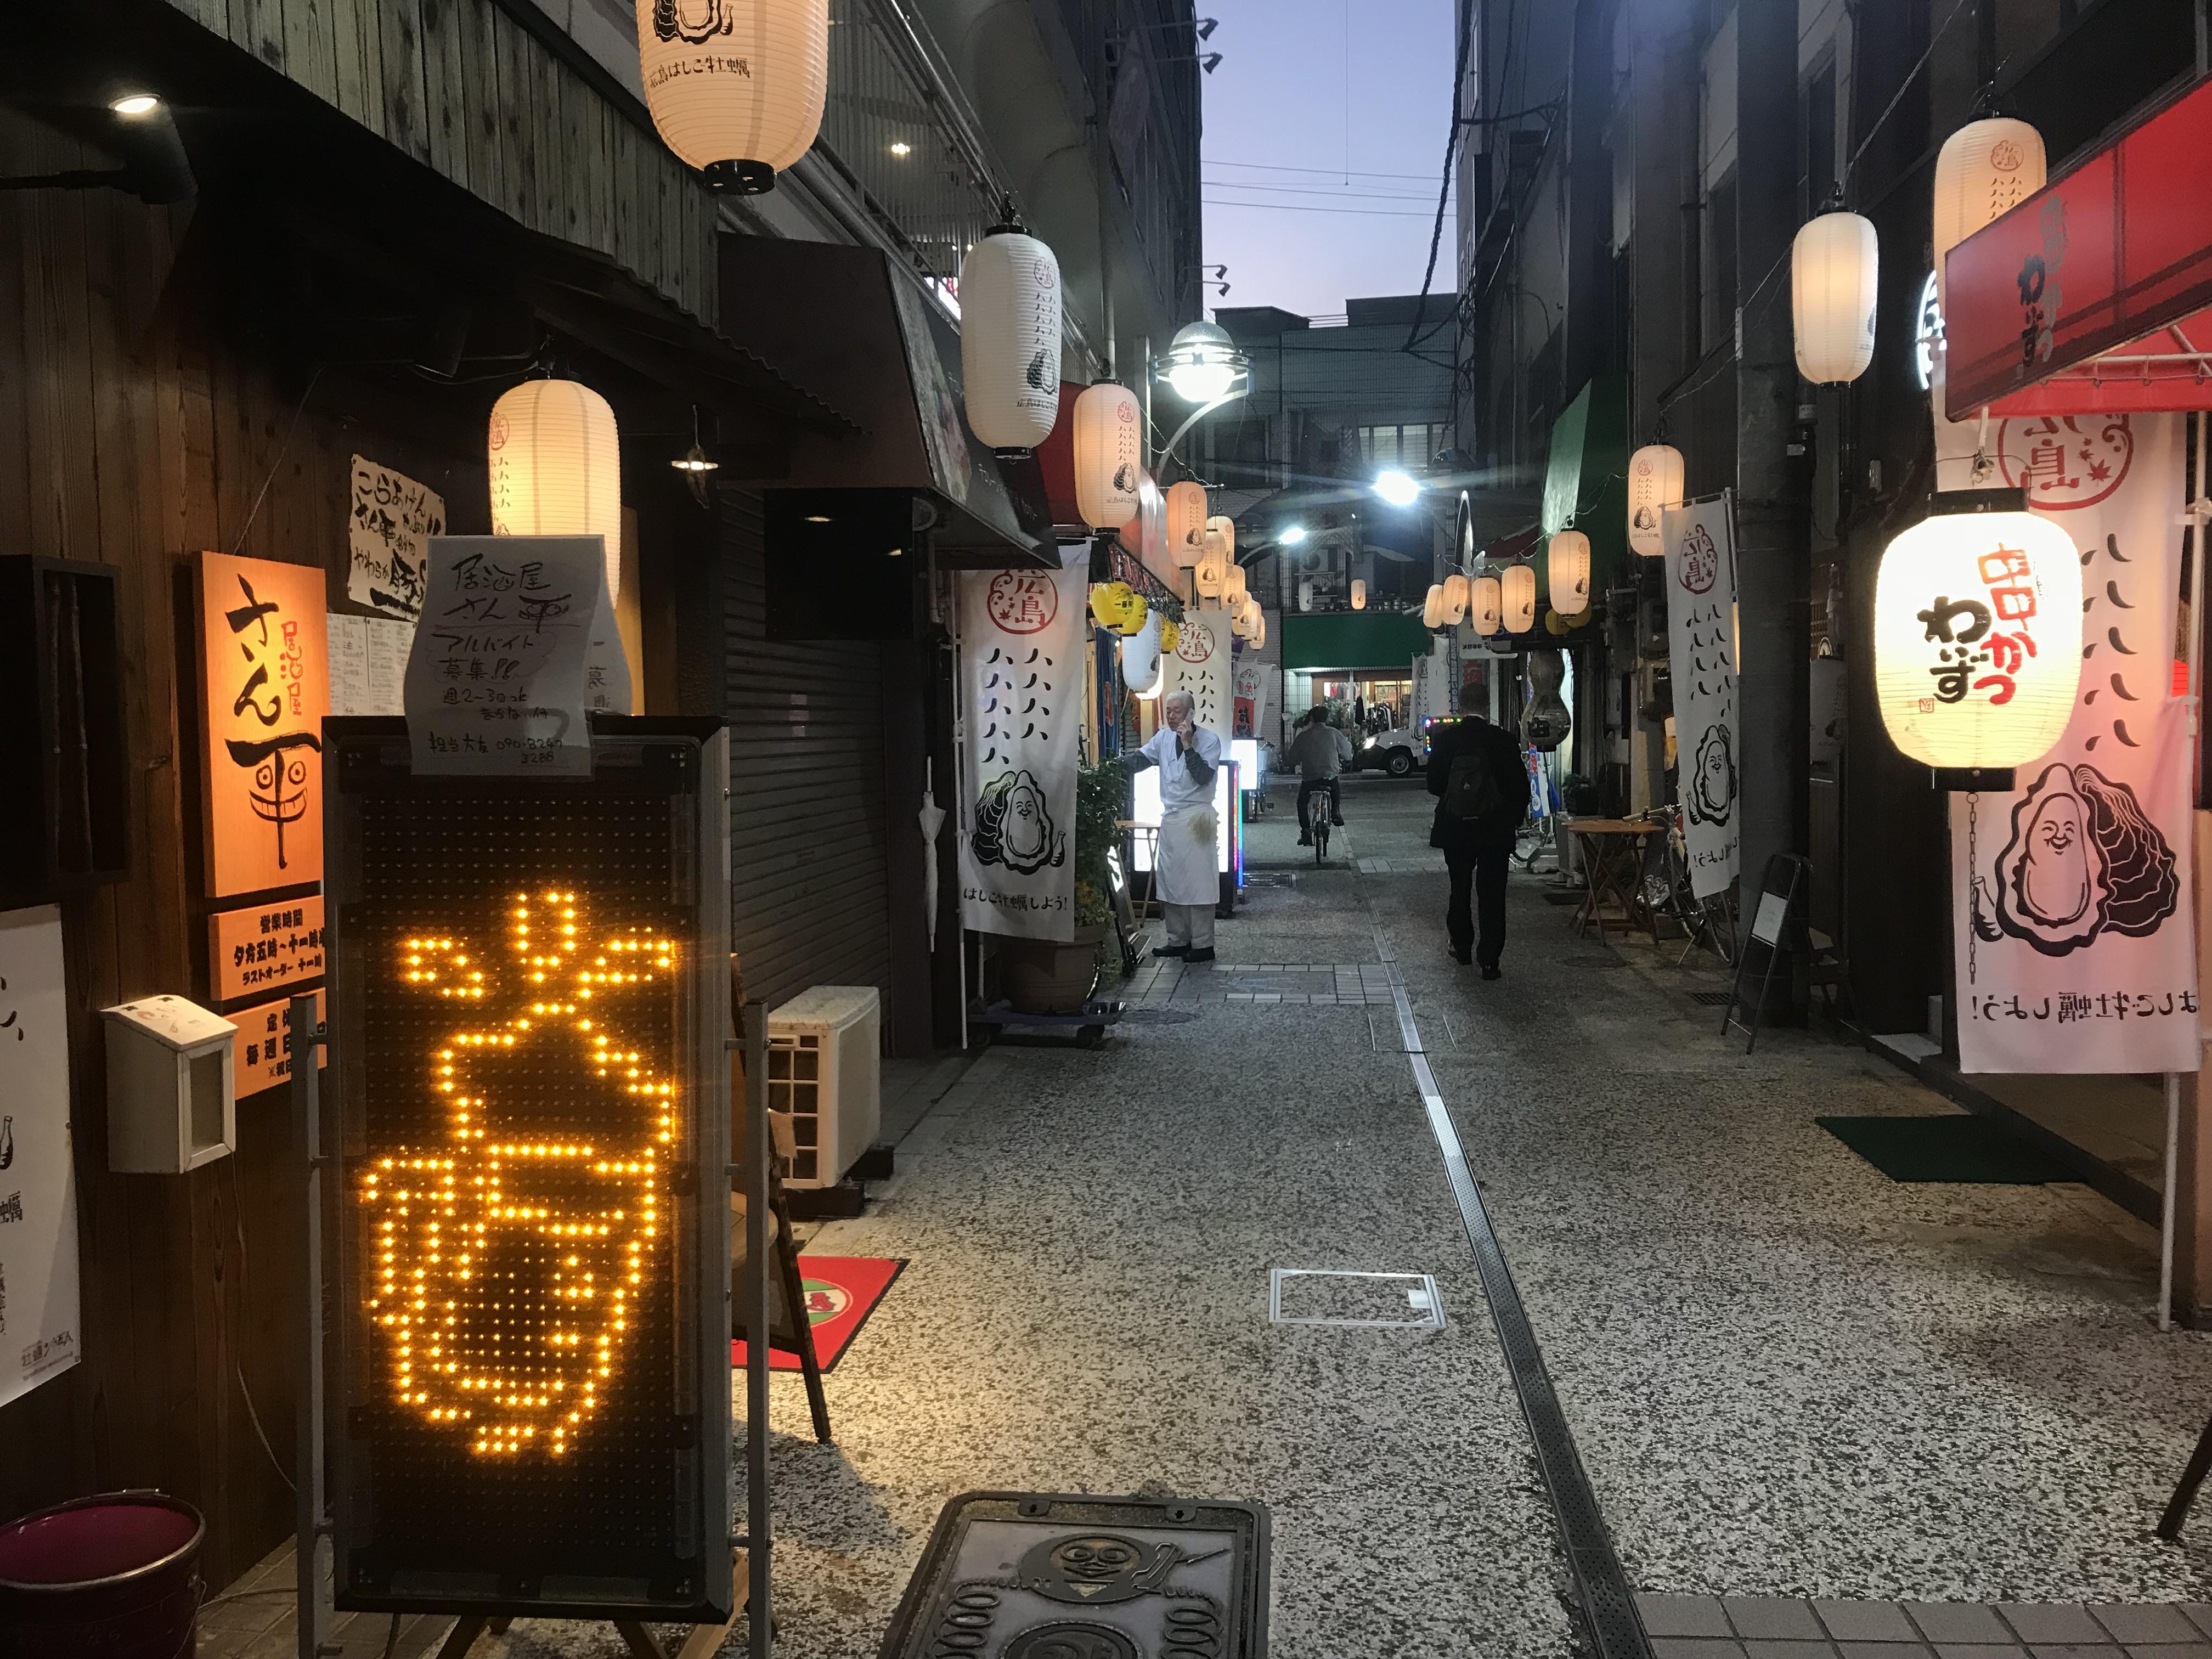 Yokogawa Shopping Area